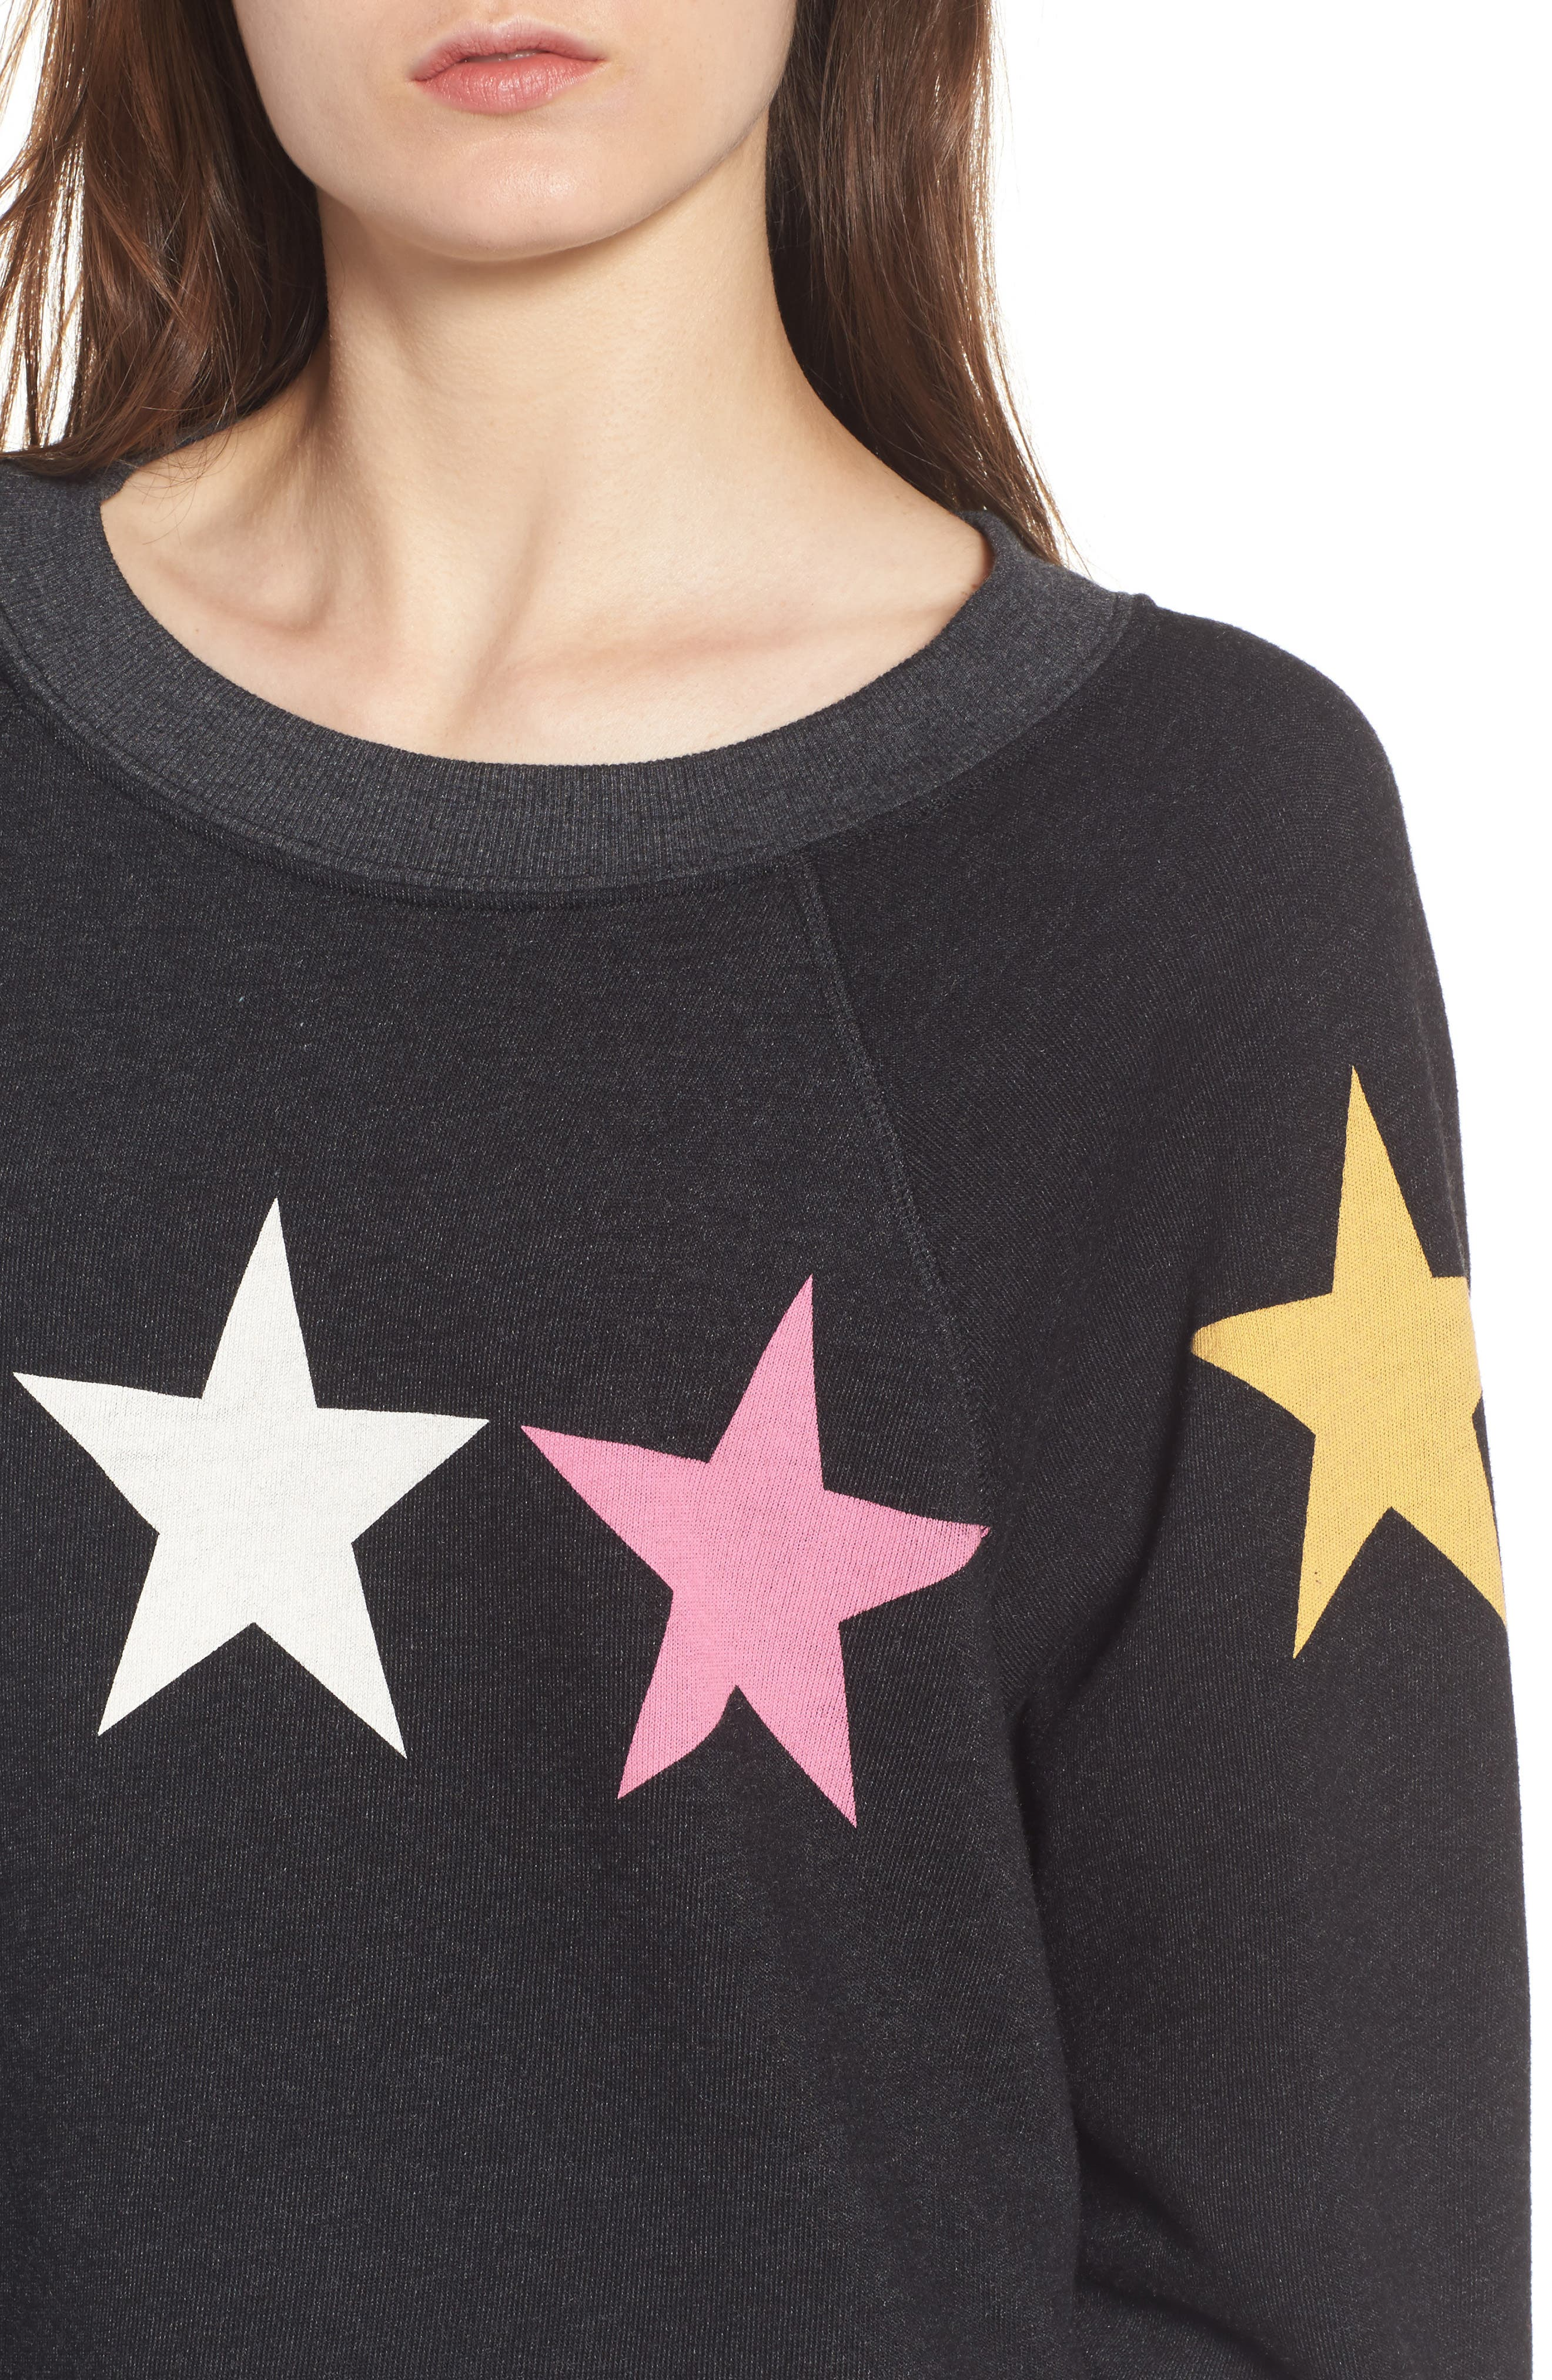 Arcade Stars Sommers Sweatshirt,                             Alternate thumbnail 5, color,                             Heathered Black